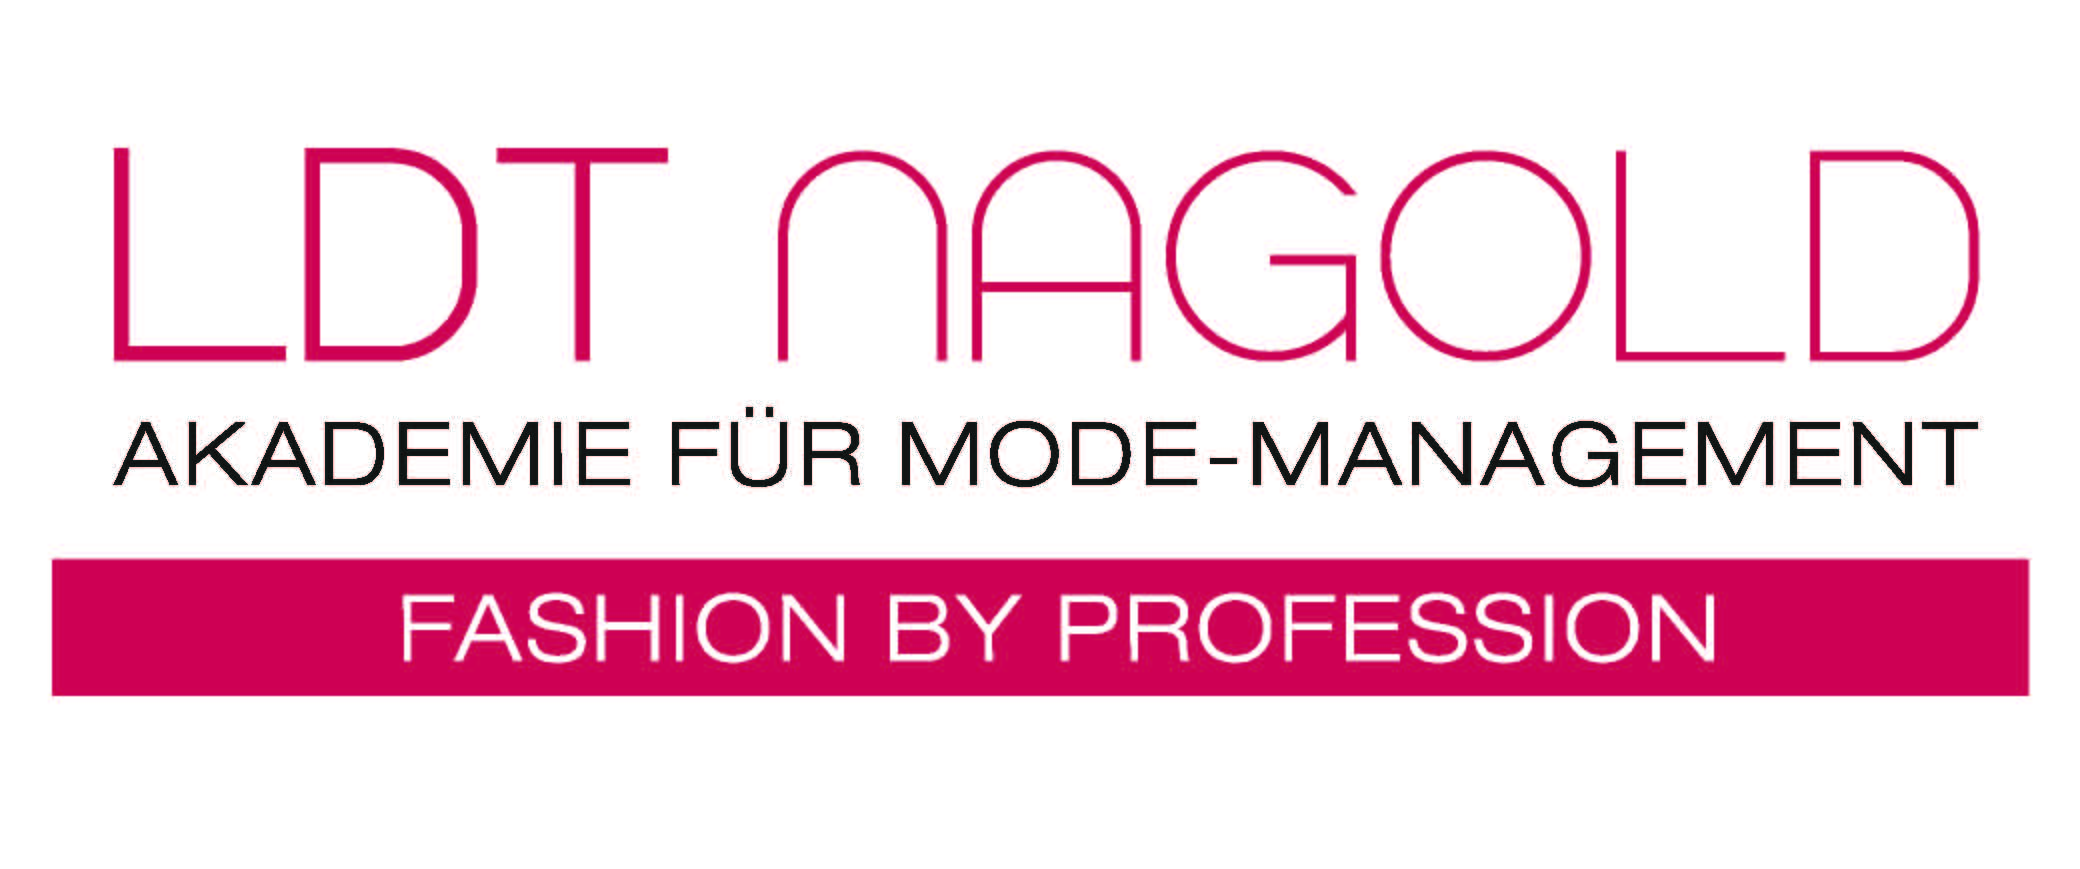 LDT Nagold GmbH